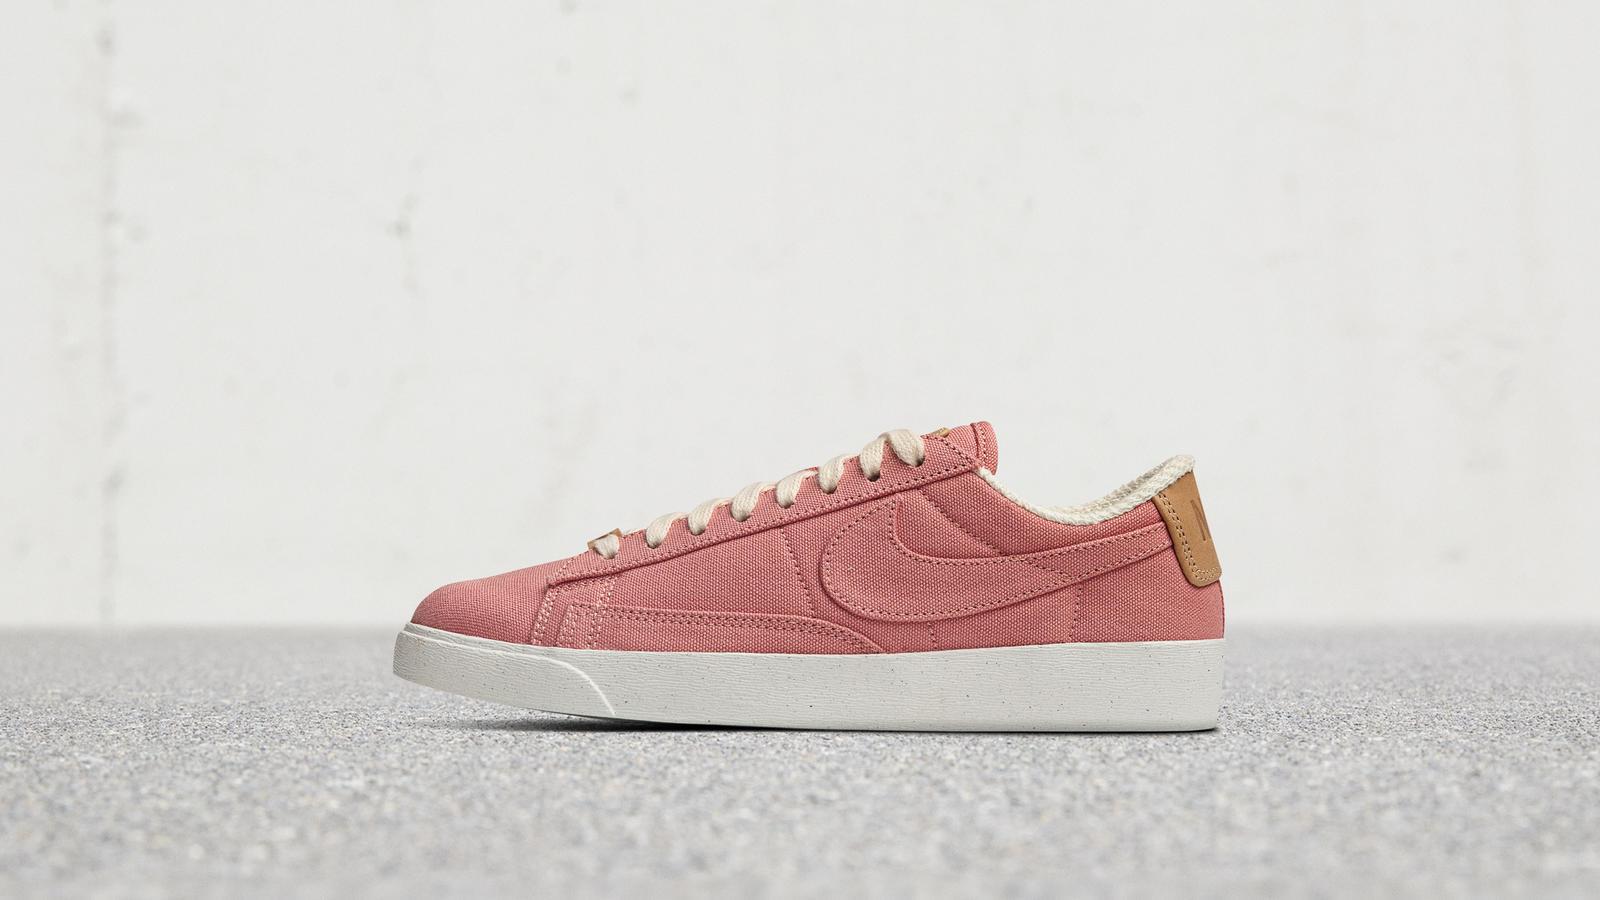 Womens Footwear Preview: Summer 2019 10